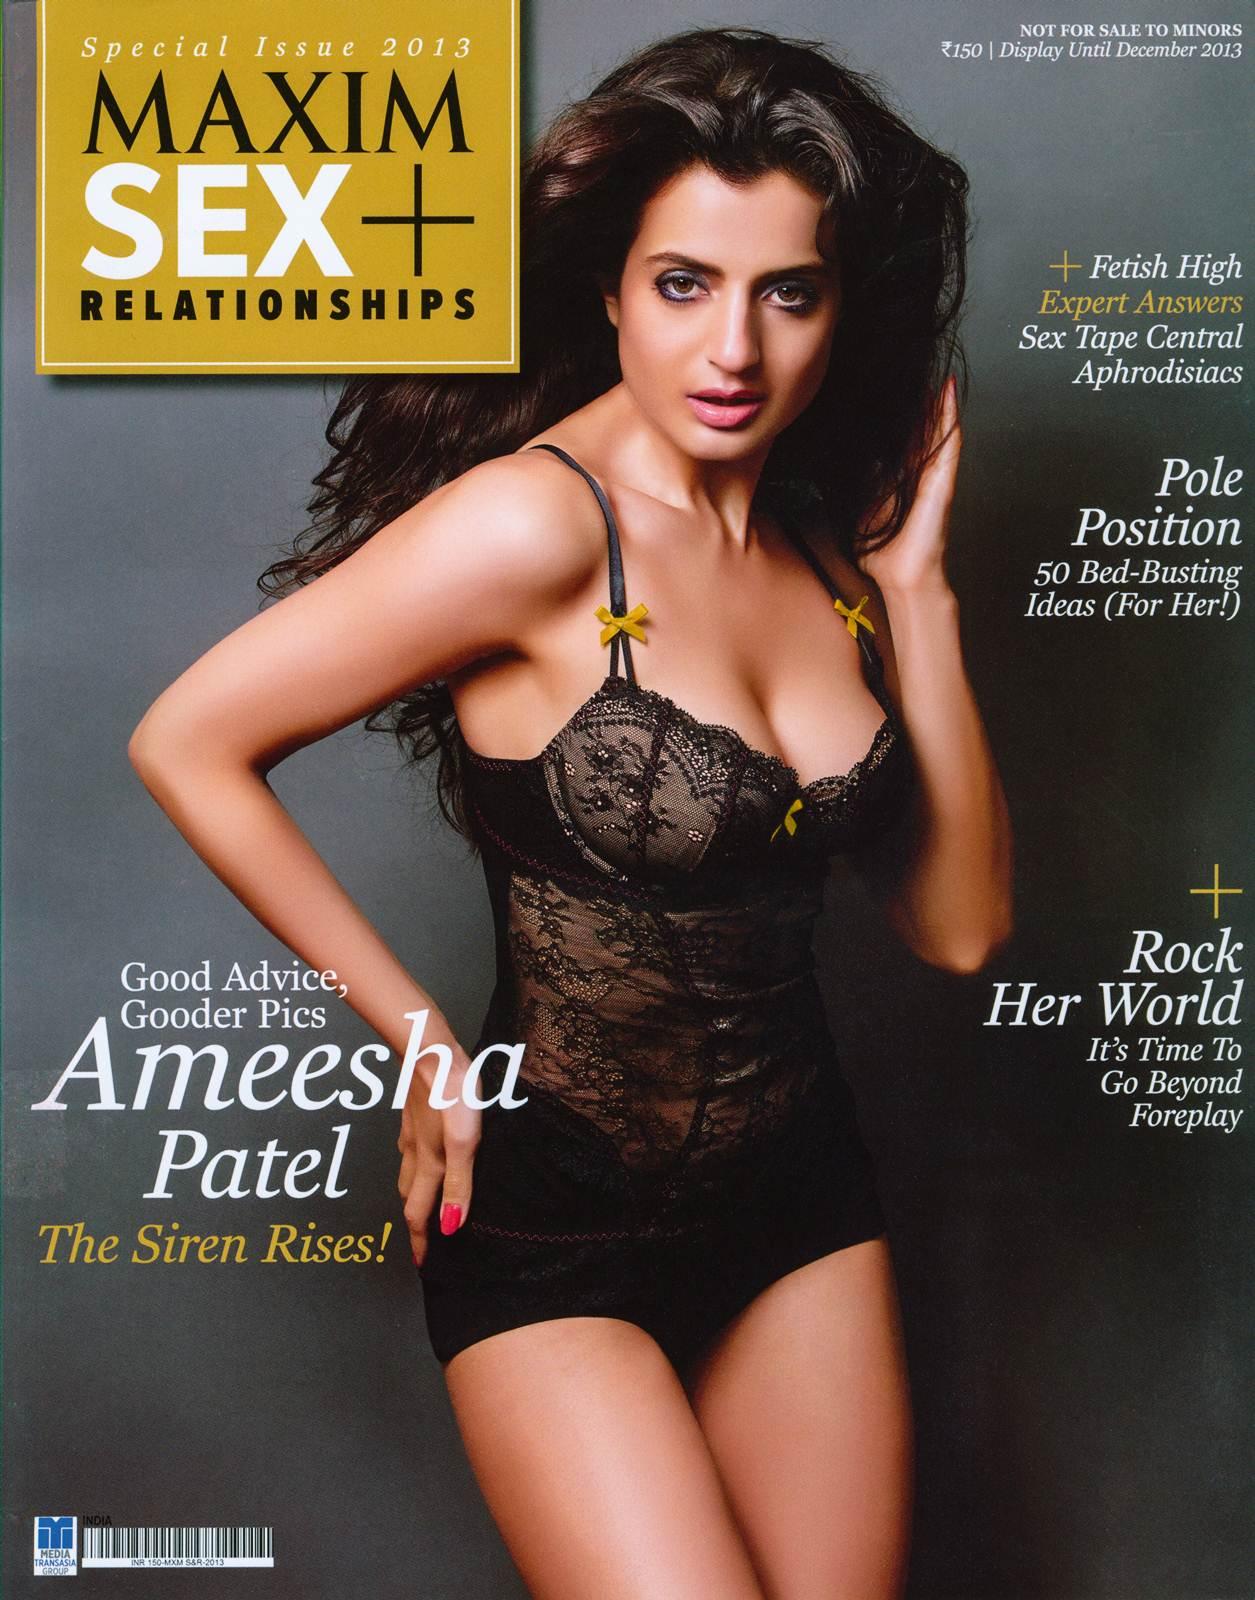 Ameesha Patel 2016 ameesha patel in maxim magazine wallpaper, hd indian